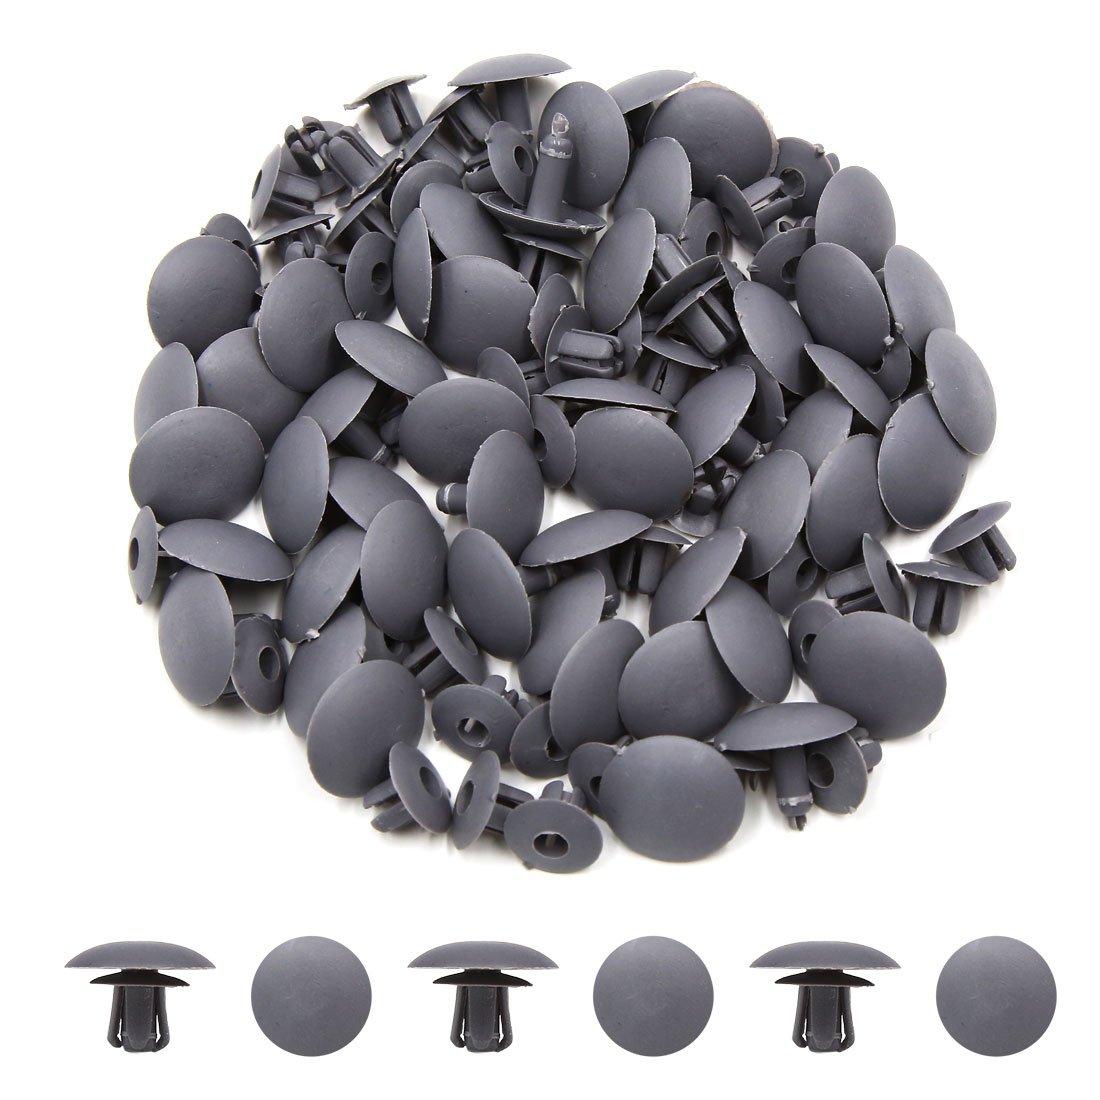 uxcell 50pcs 7mm Hole Car Plastic Clips Rivet Fit Boot Trim Panel Pin Fender Gray